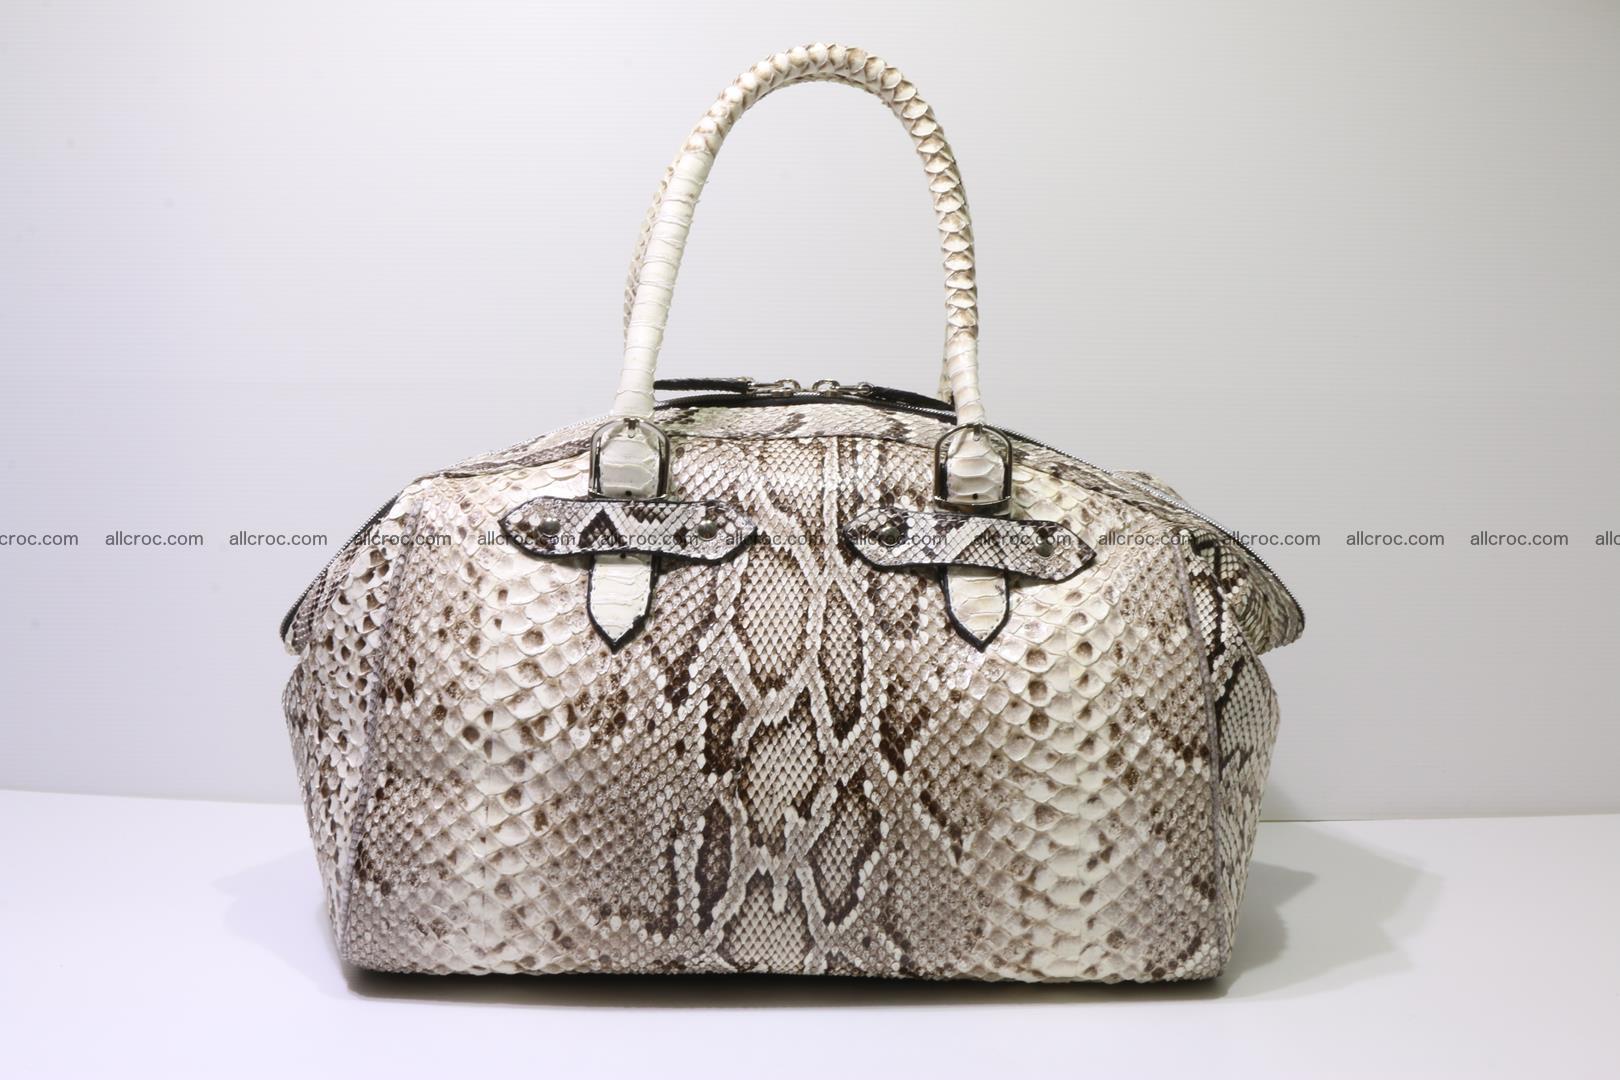 Python handbag for women from genuine python skin 219 Foto 0